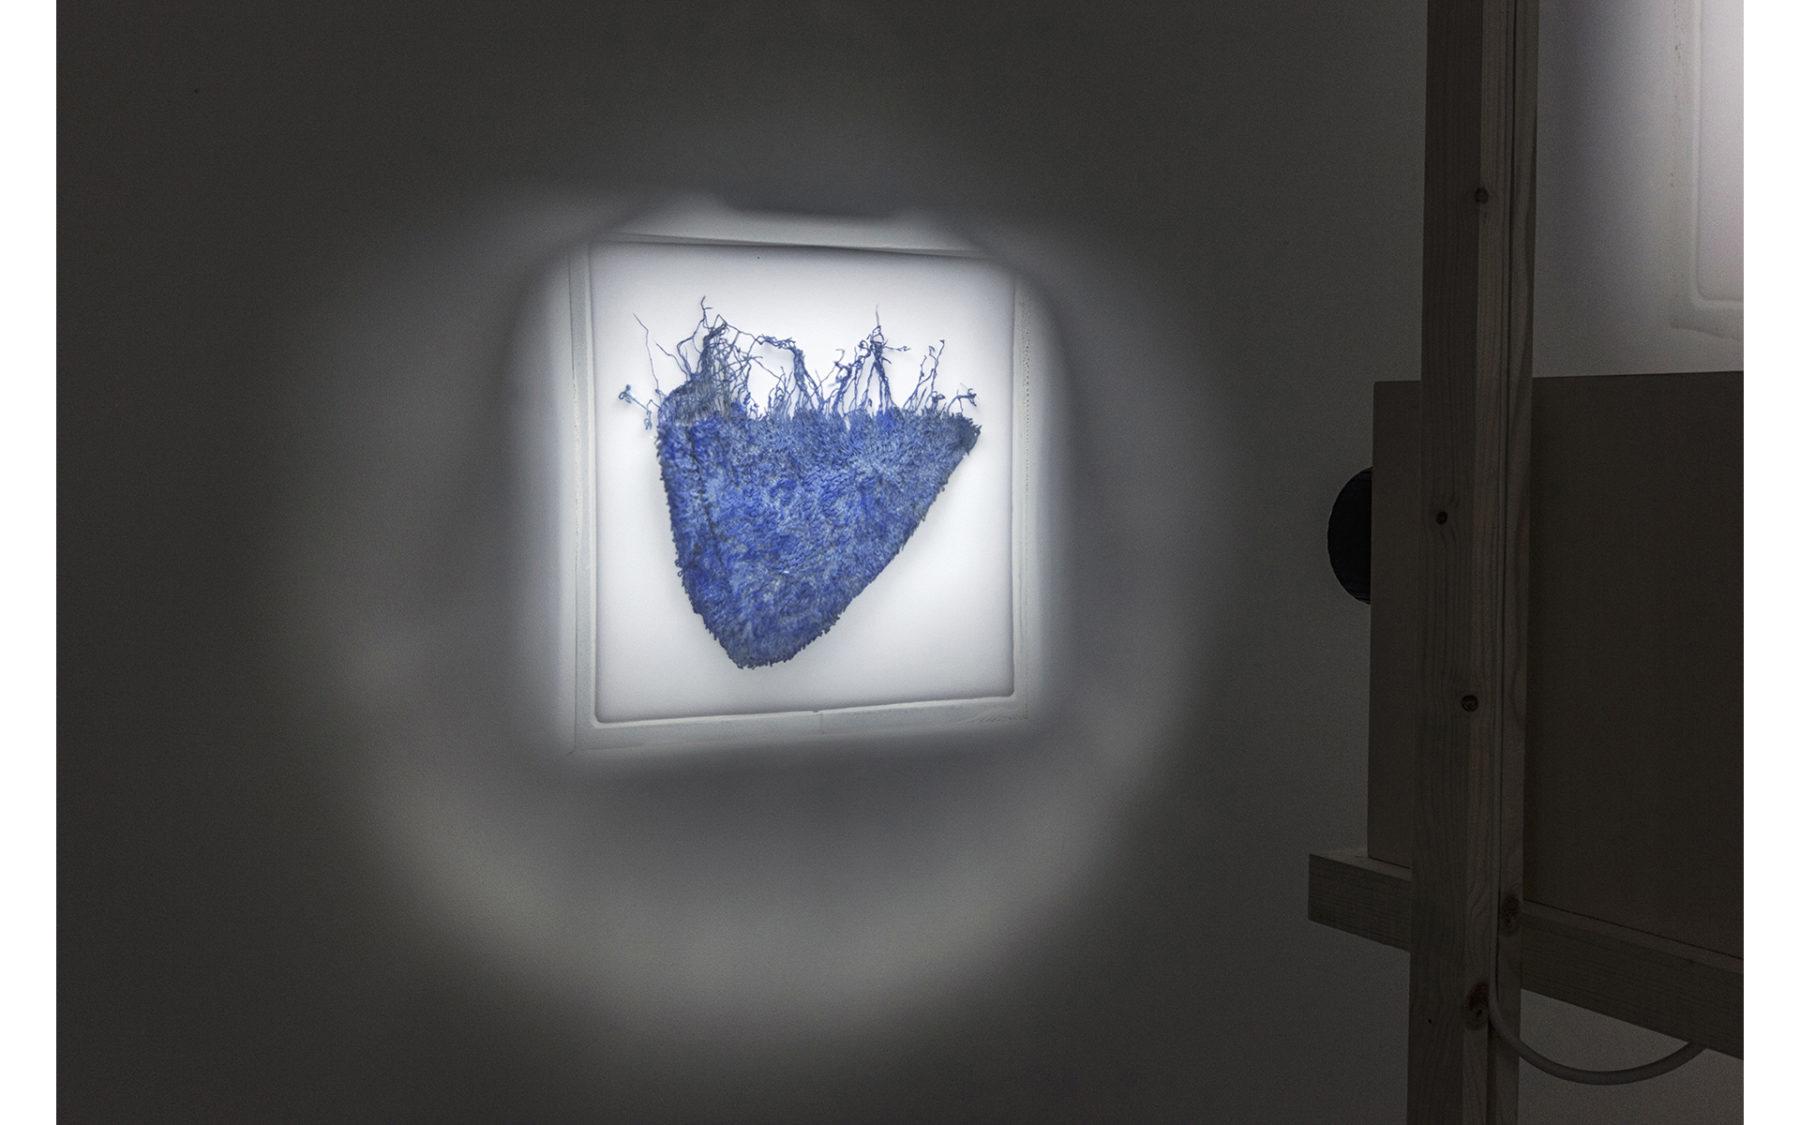 David de Tscharner /Fantasmagorie/